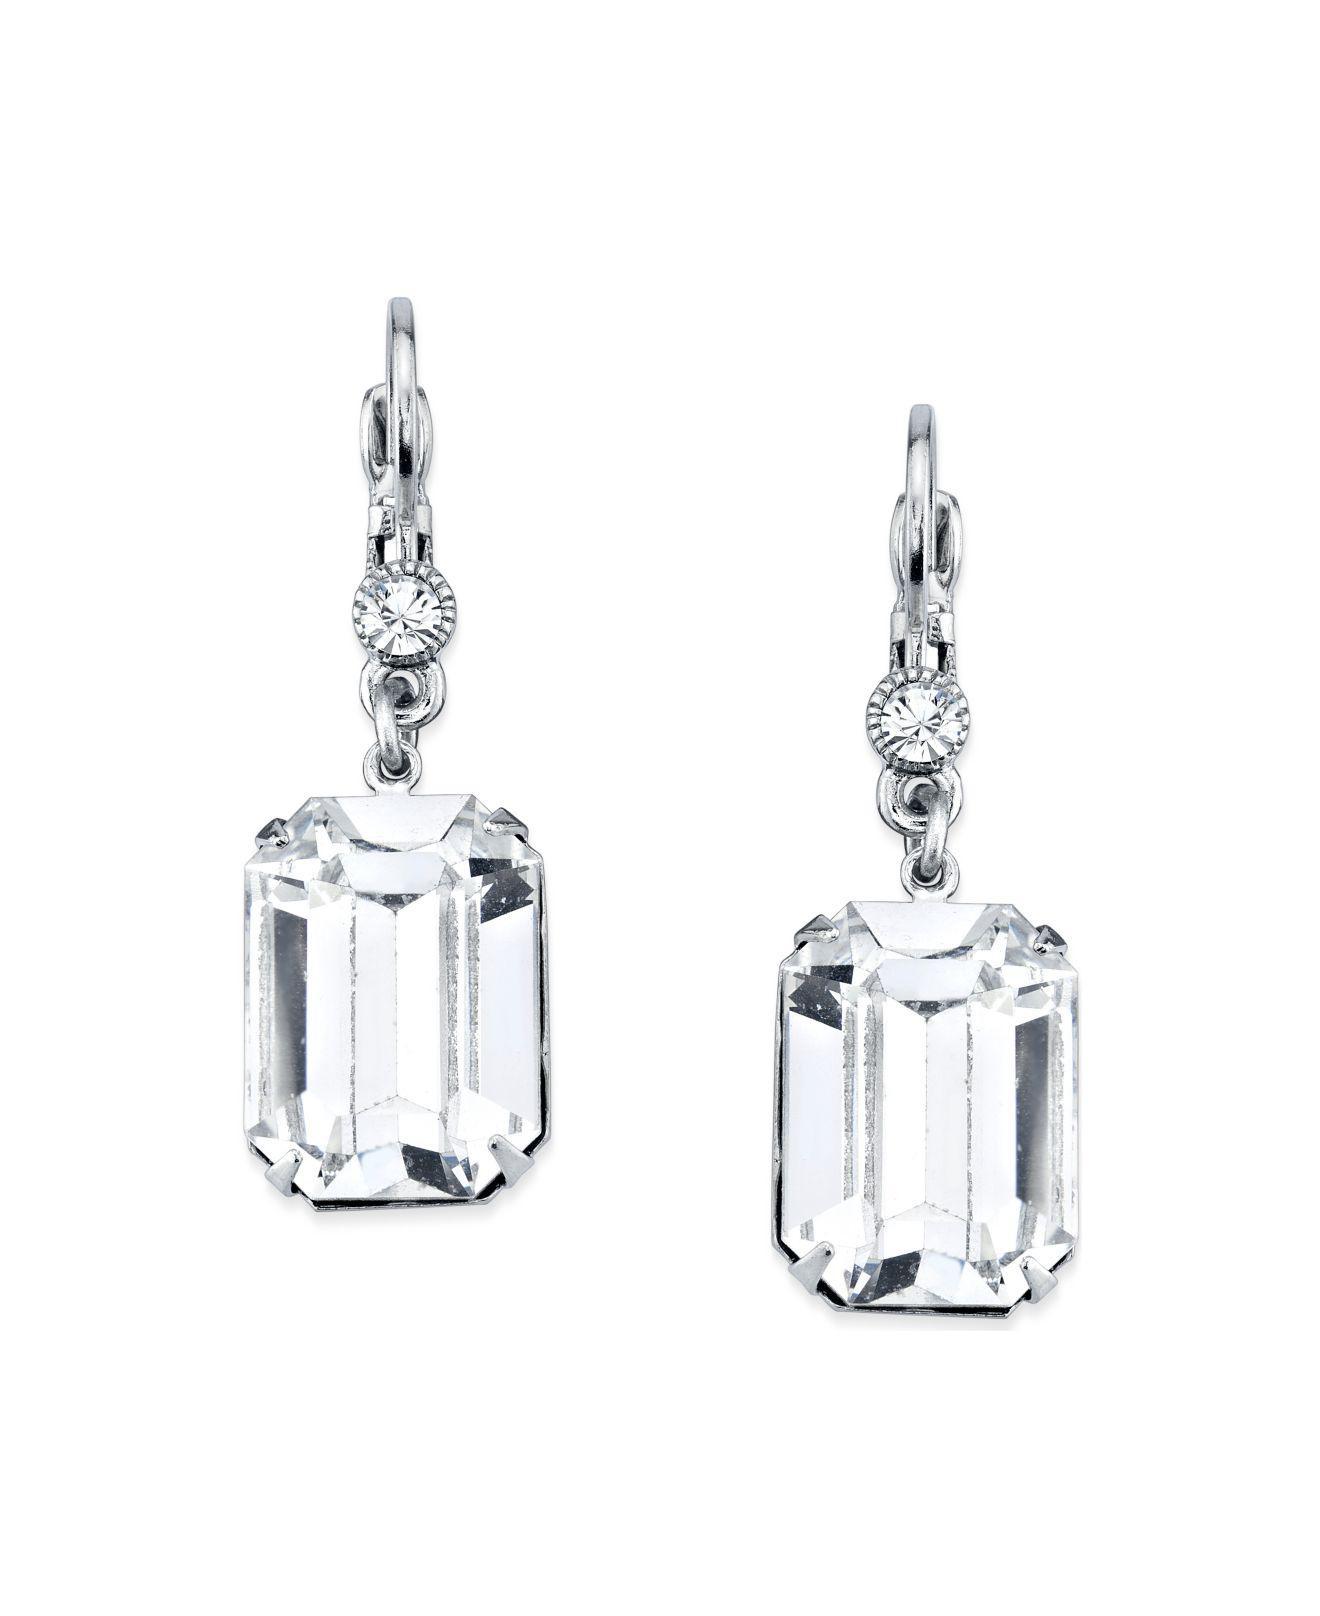 f9b39b9570b3 2028. Women s Metallic Silver-tone Genuine Swarovski Crystal Square Drop  Earrings